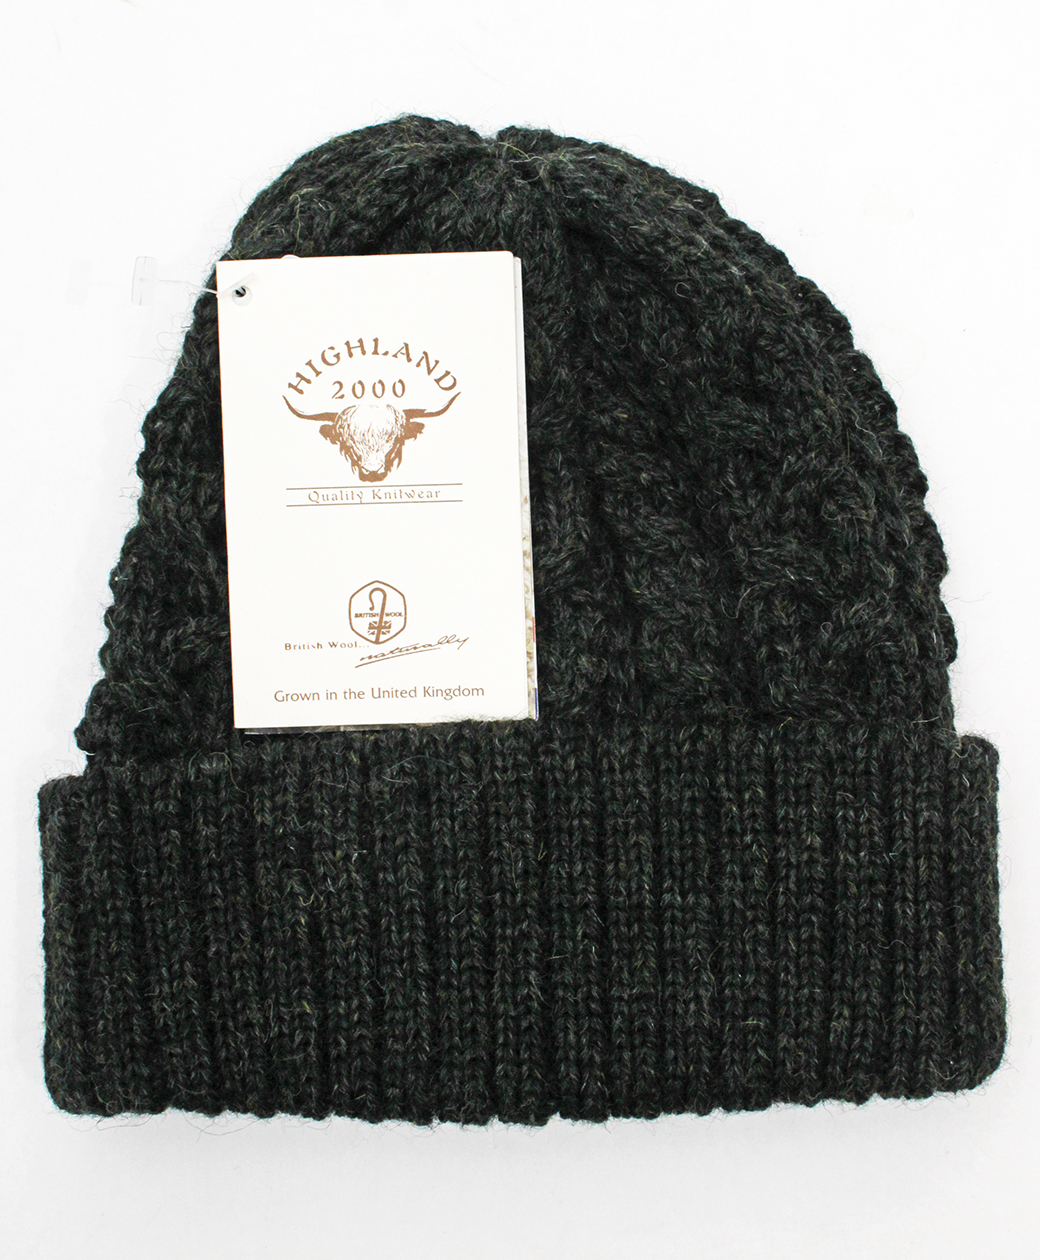 Highland 2000 ※1月24日(日)まで!! 2020AW COLLECTION SALE !! bob cap(Moss)